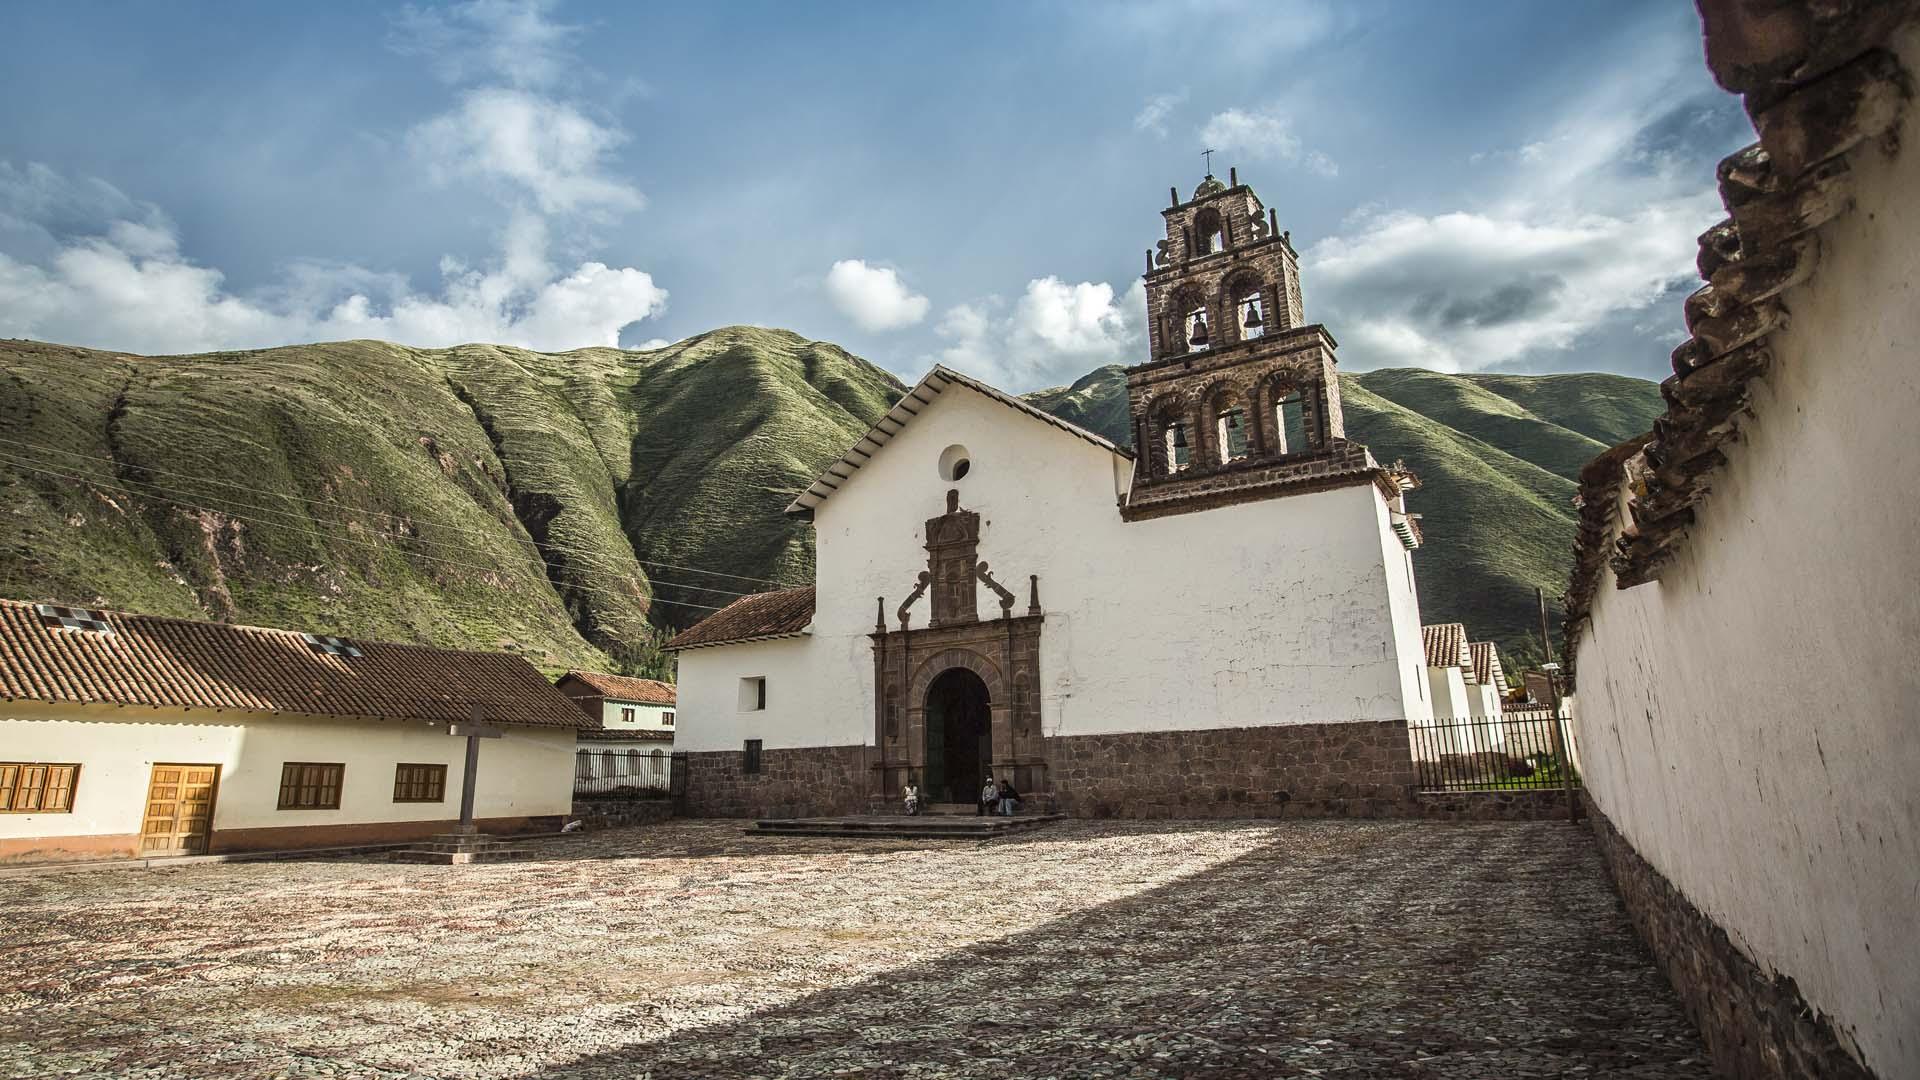 Ruta del Barroco Andino - San Juan Bautista de Huaro